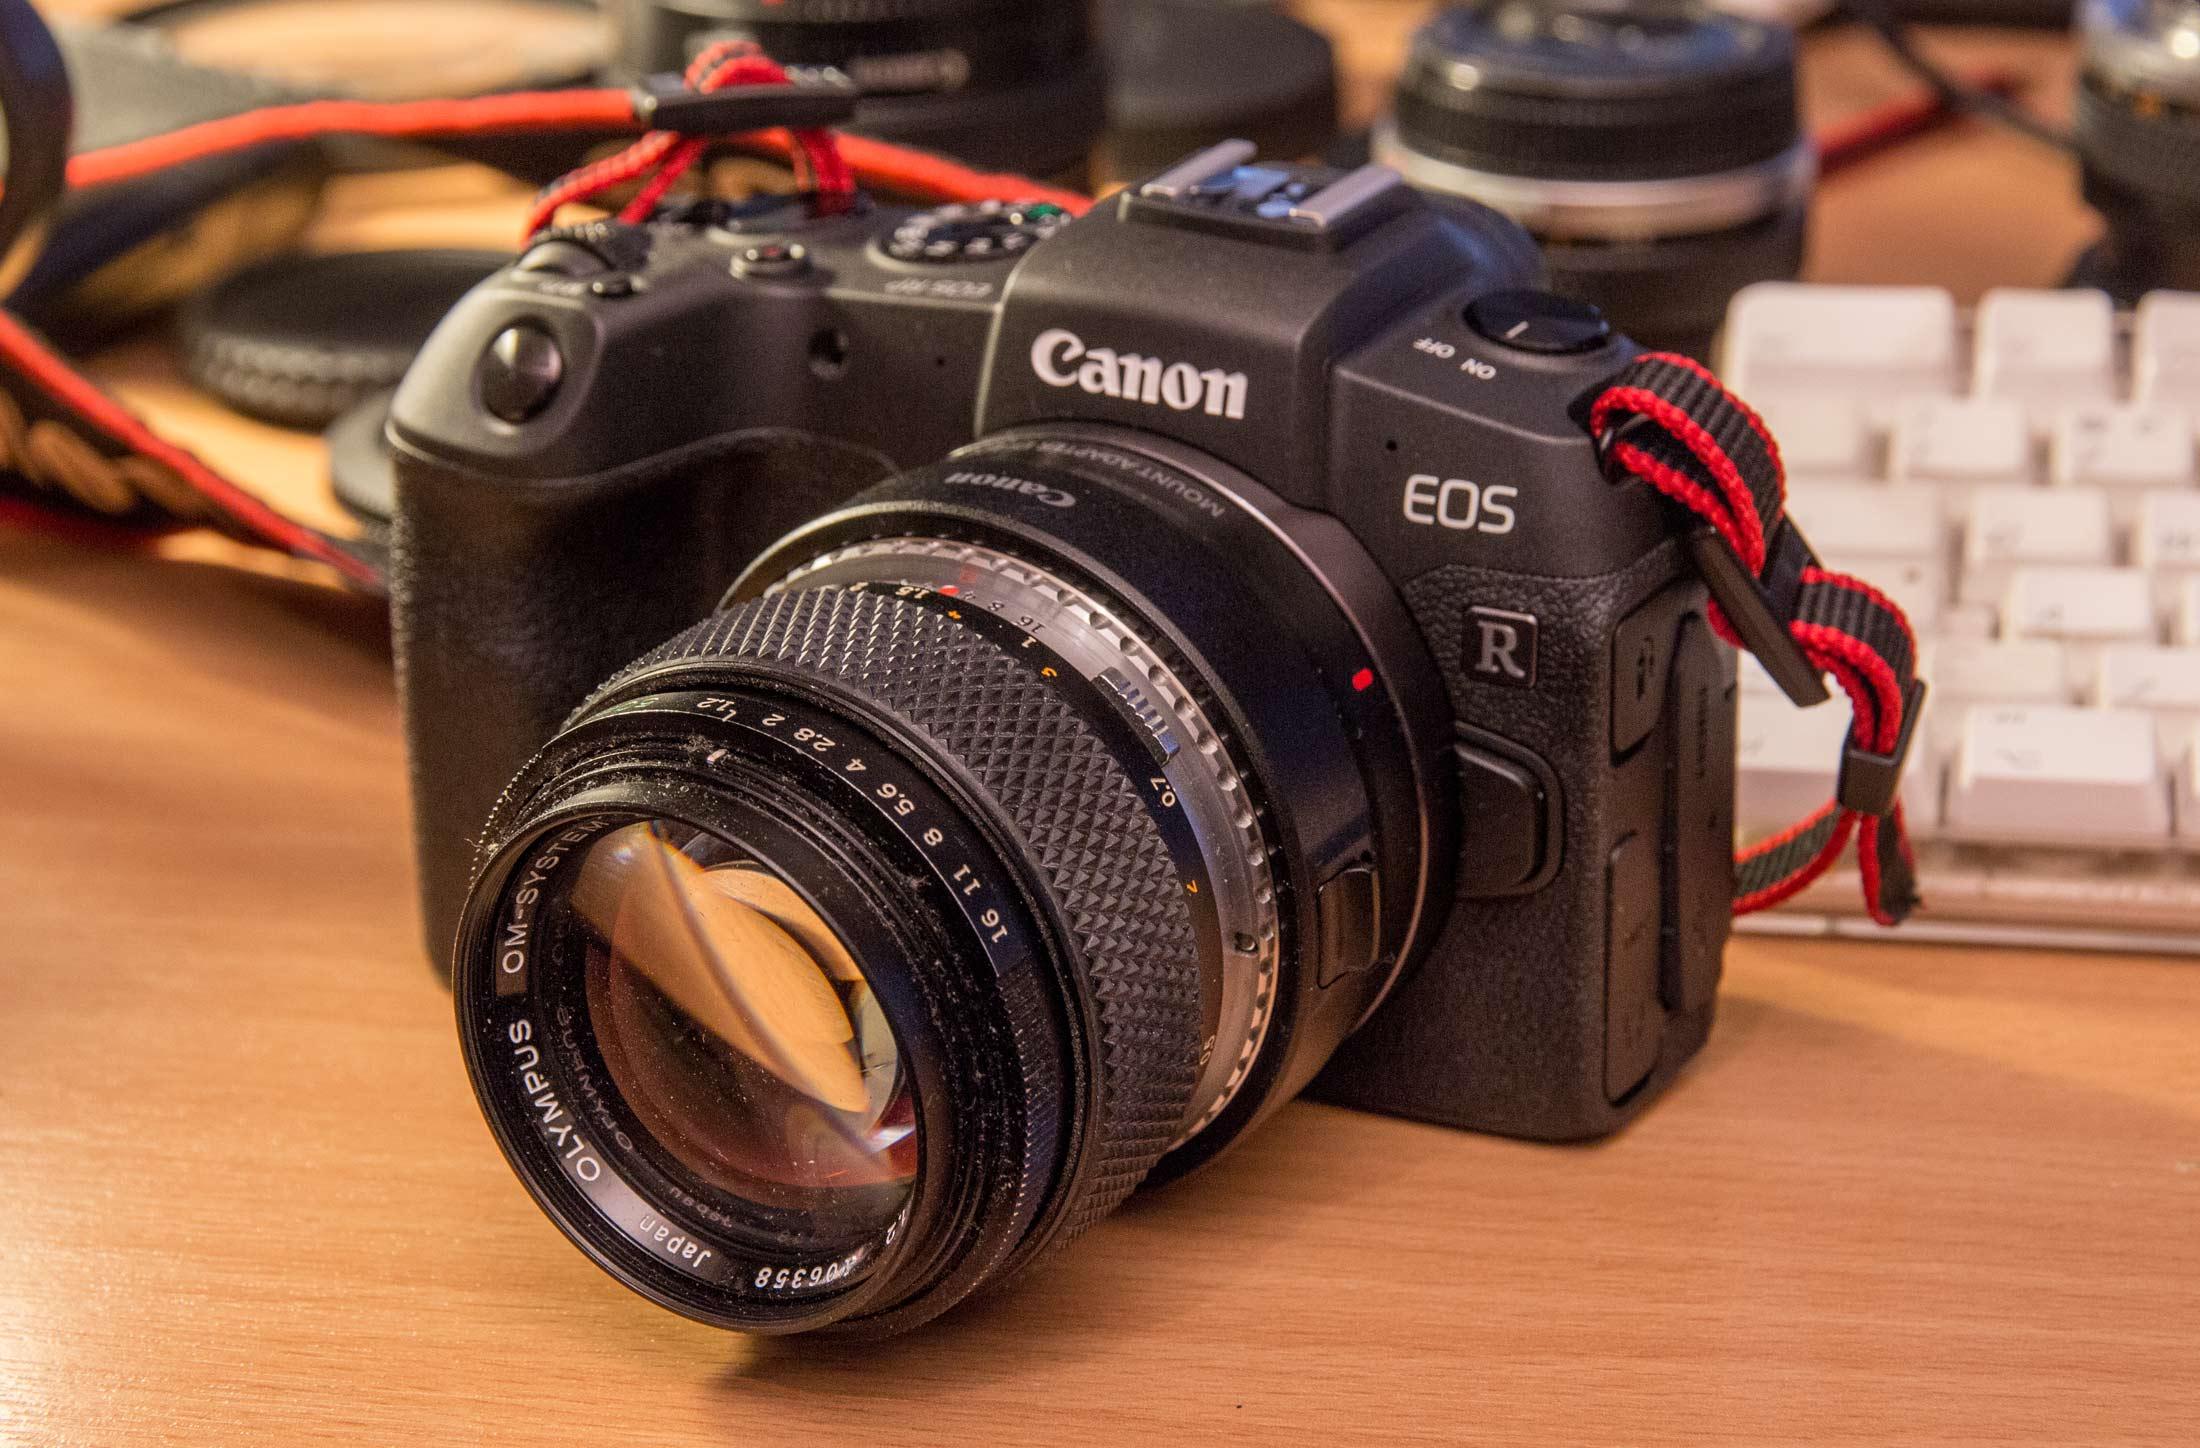 rp and Zuiko 50mm f/1.2